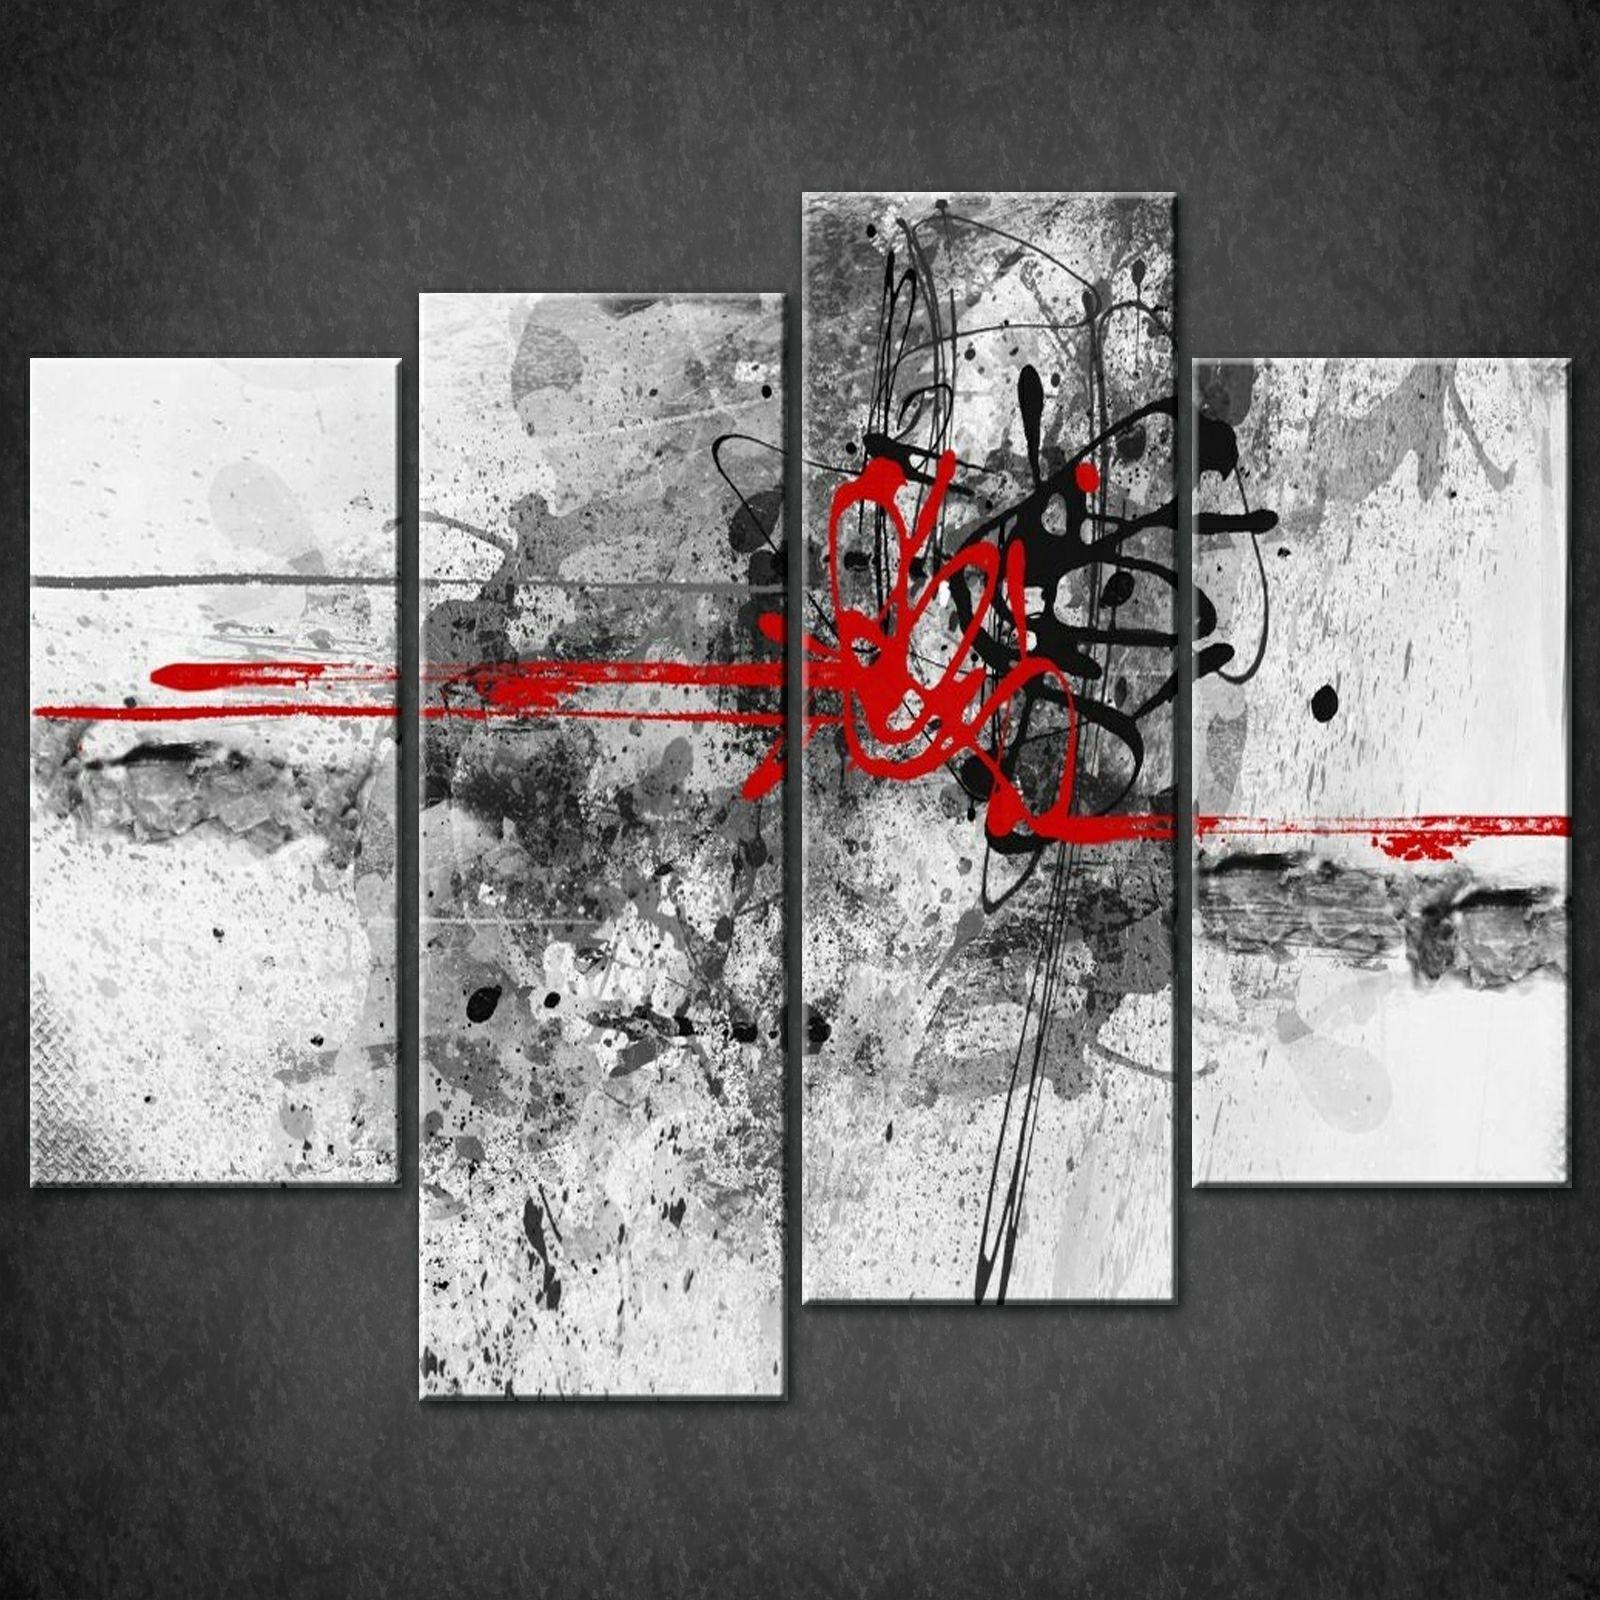 Wall Art Designs: Abstract Canvas Wall Art Abstract Canvas Wall Pertaining To Most Recent Abstract Canvas Wall Art Iii (View 15 of 20)